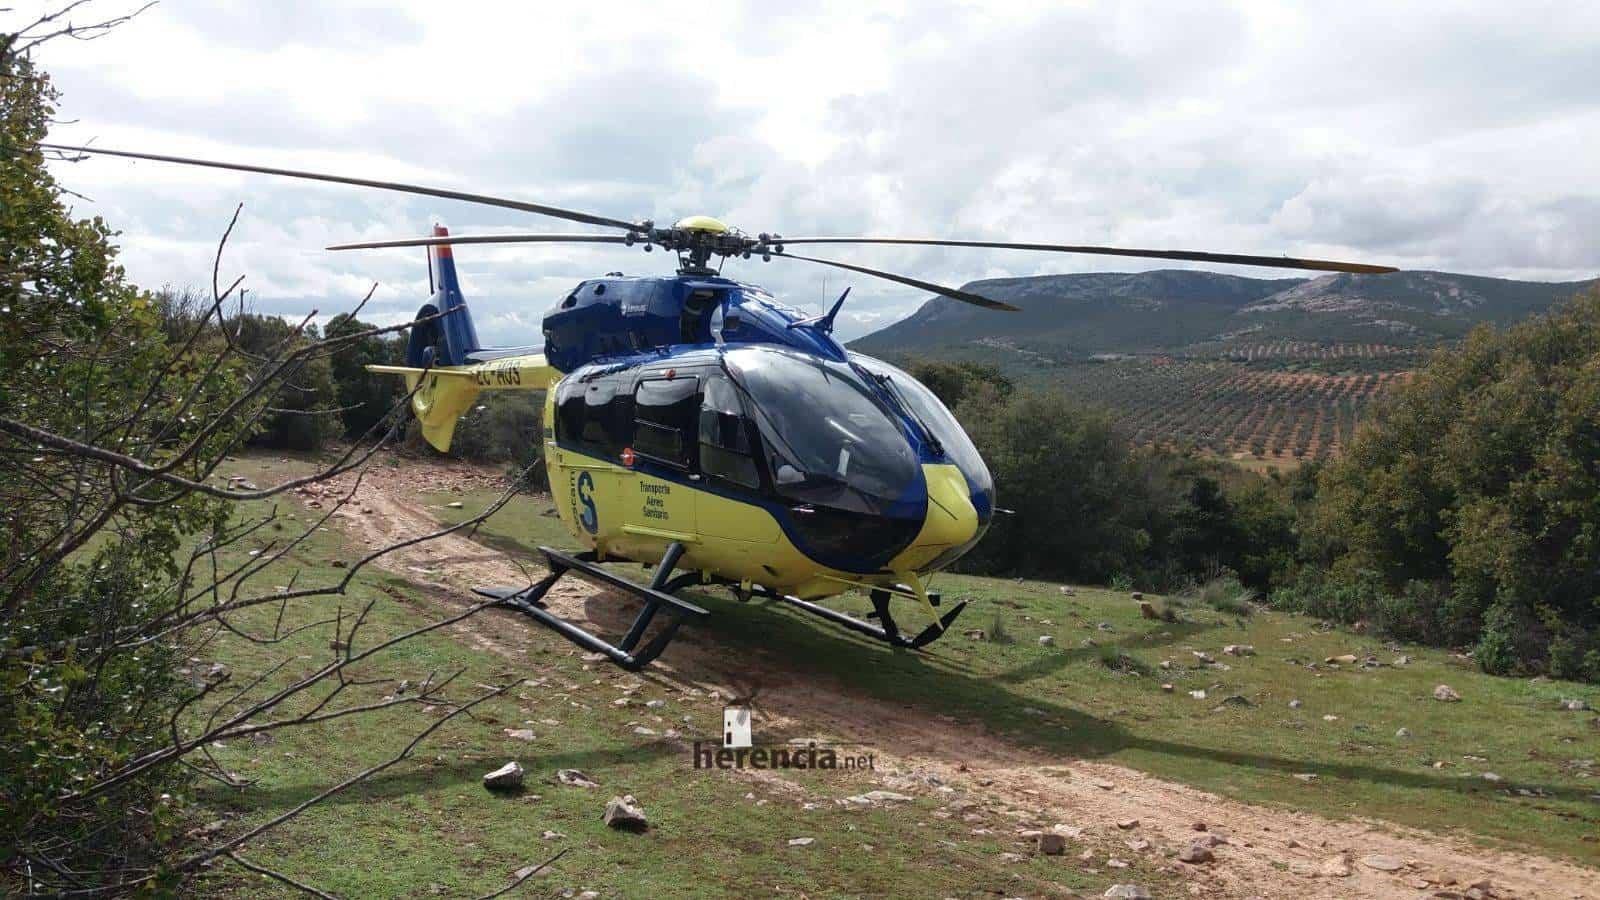 accidente pozo del agua helicoptero sescam - Un helicóptero del SESCAM rescata una senderista accidentada en Herencia